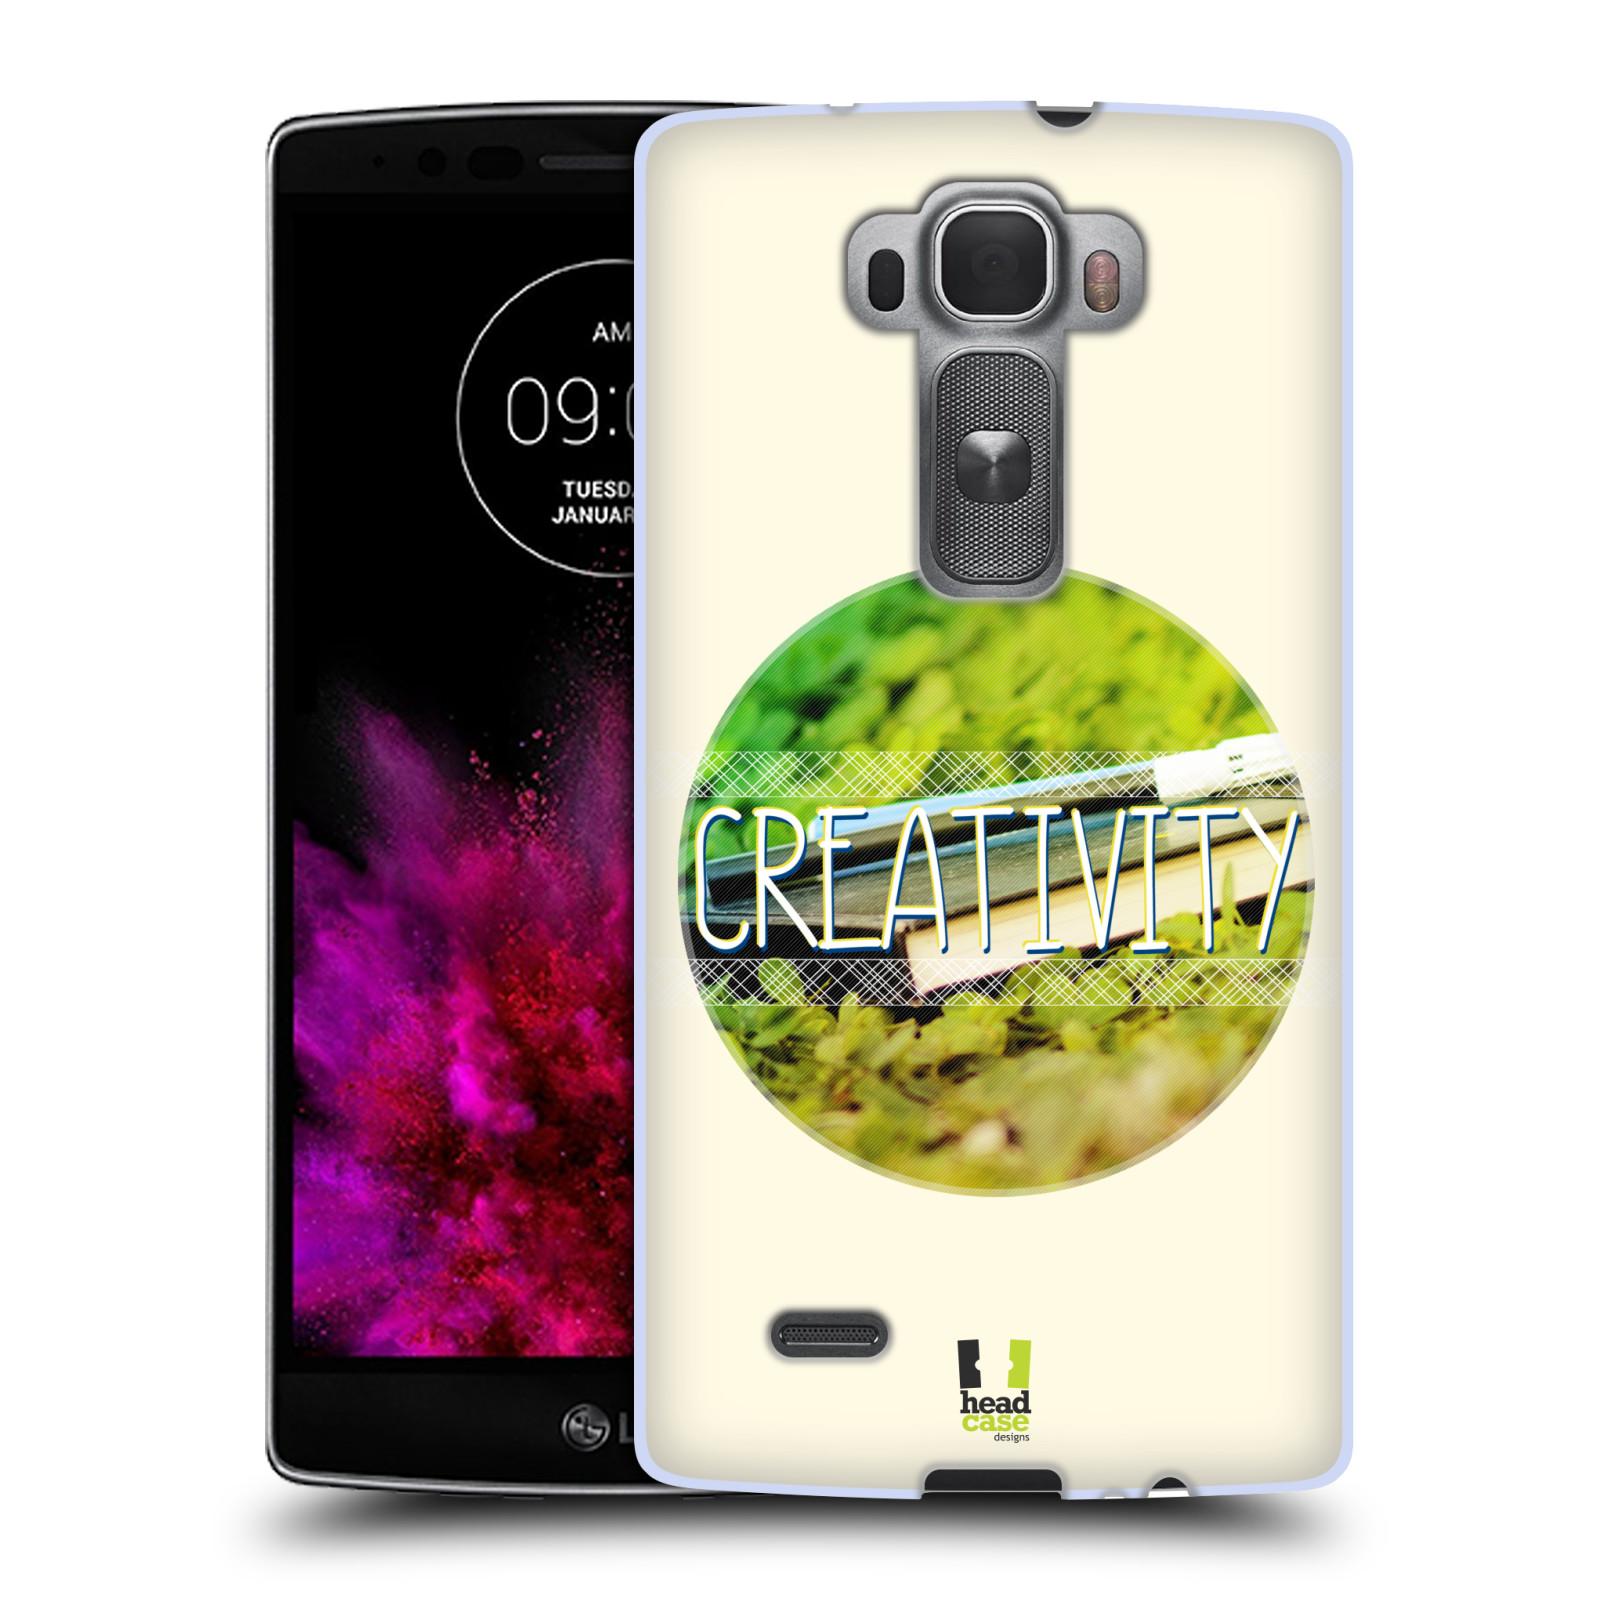 Silikonové pouzdro na mobil LG G Flex 2 HEAD CASE INSPIRACE V KRUHU KREATIVITA (Silikonový kryt či obal na mobilní telefon LG G Flex 2 H955)